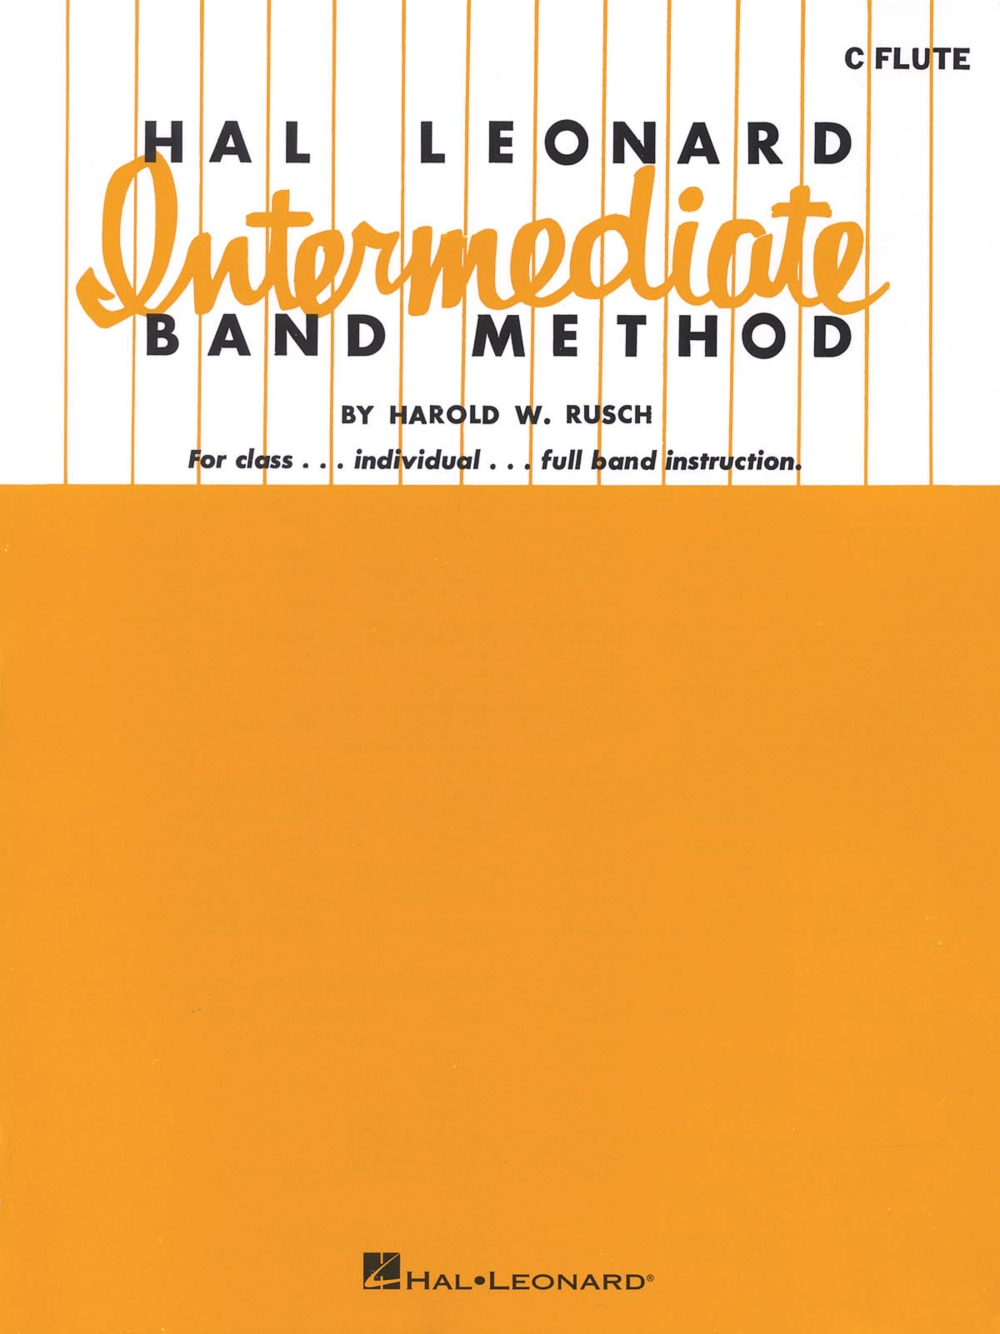 Hal Leonard Hal Leonard Intermediate Band Method (Bassoon) Intermediate Band Method Series by Hal Leonard